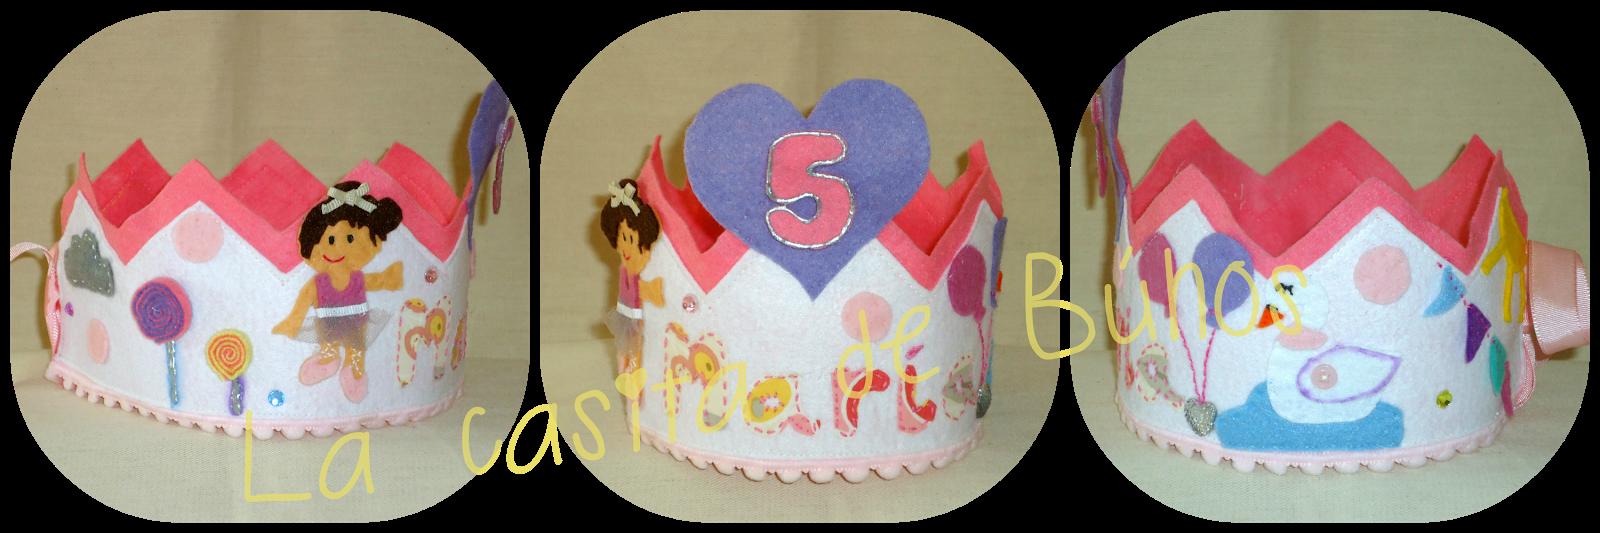 Corona cumpleaños ballet en fieltro - Felt ballet birthday crown